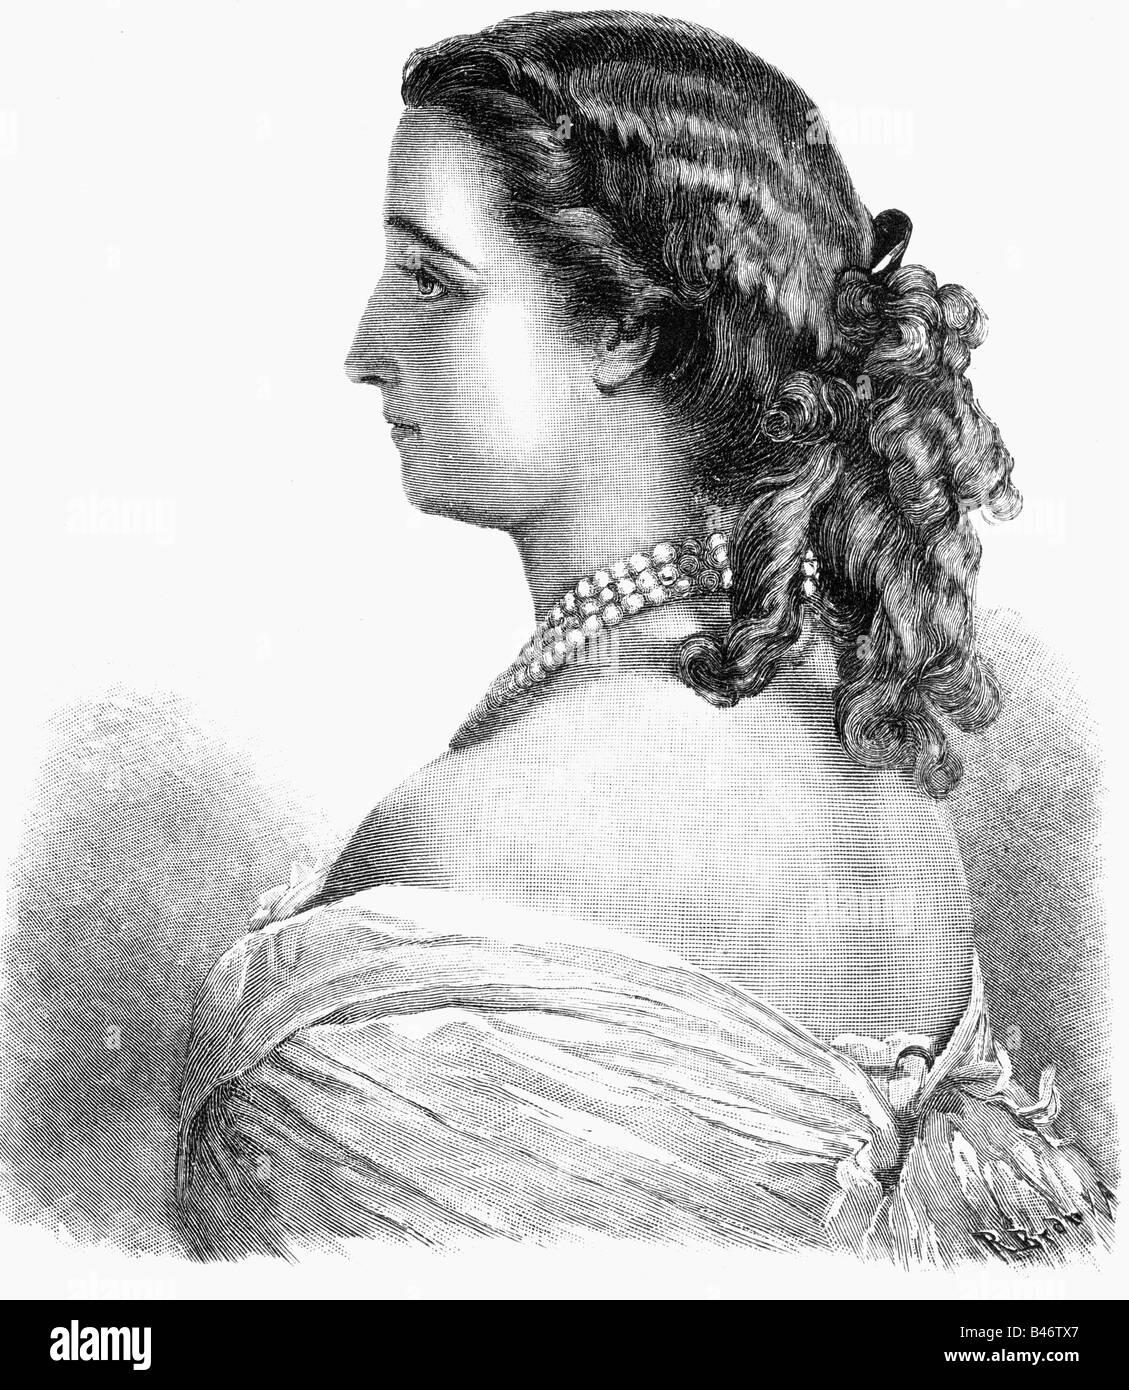 Eugenie, 5.5.1826 - 11.7.1920, Empress Consort of France 30.1.1853 - 4.9.1870, longitud media, grabado de madera Foto de stock